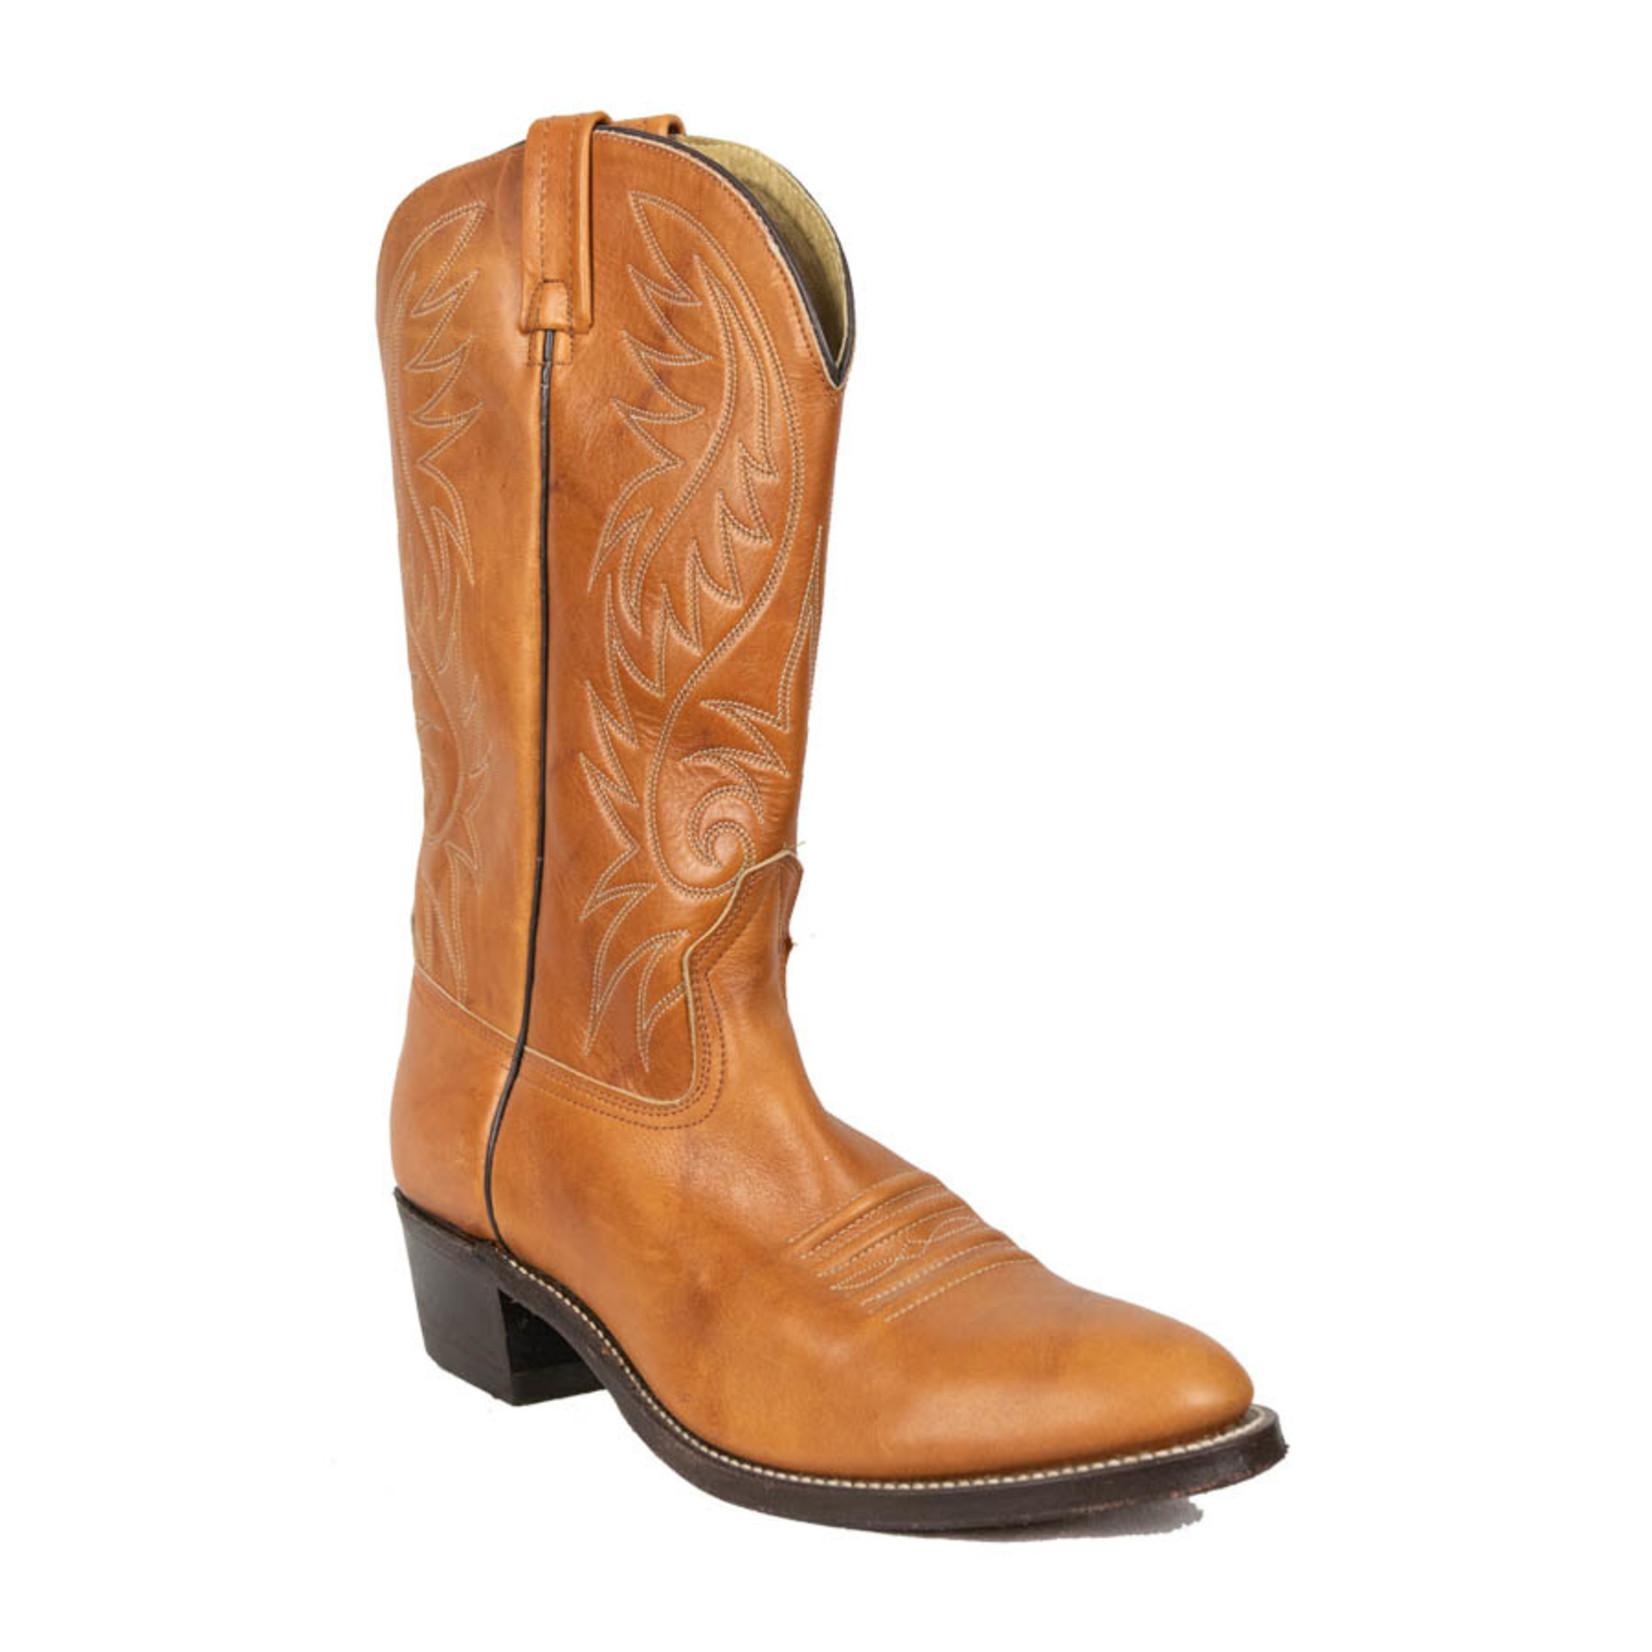 Canada West Canada West Acme Cowboy Boot 6513 E